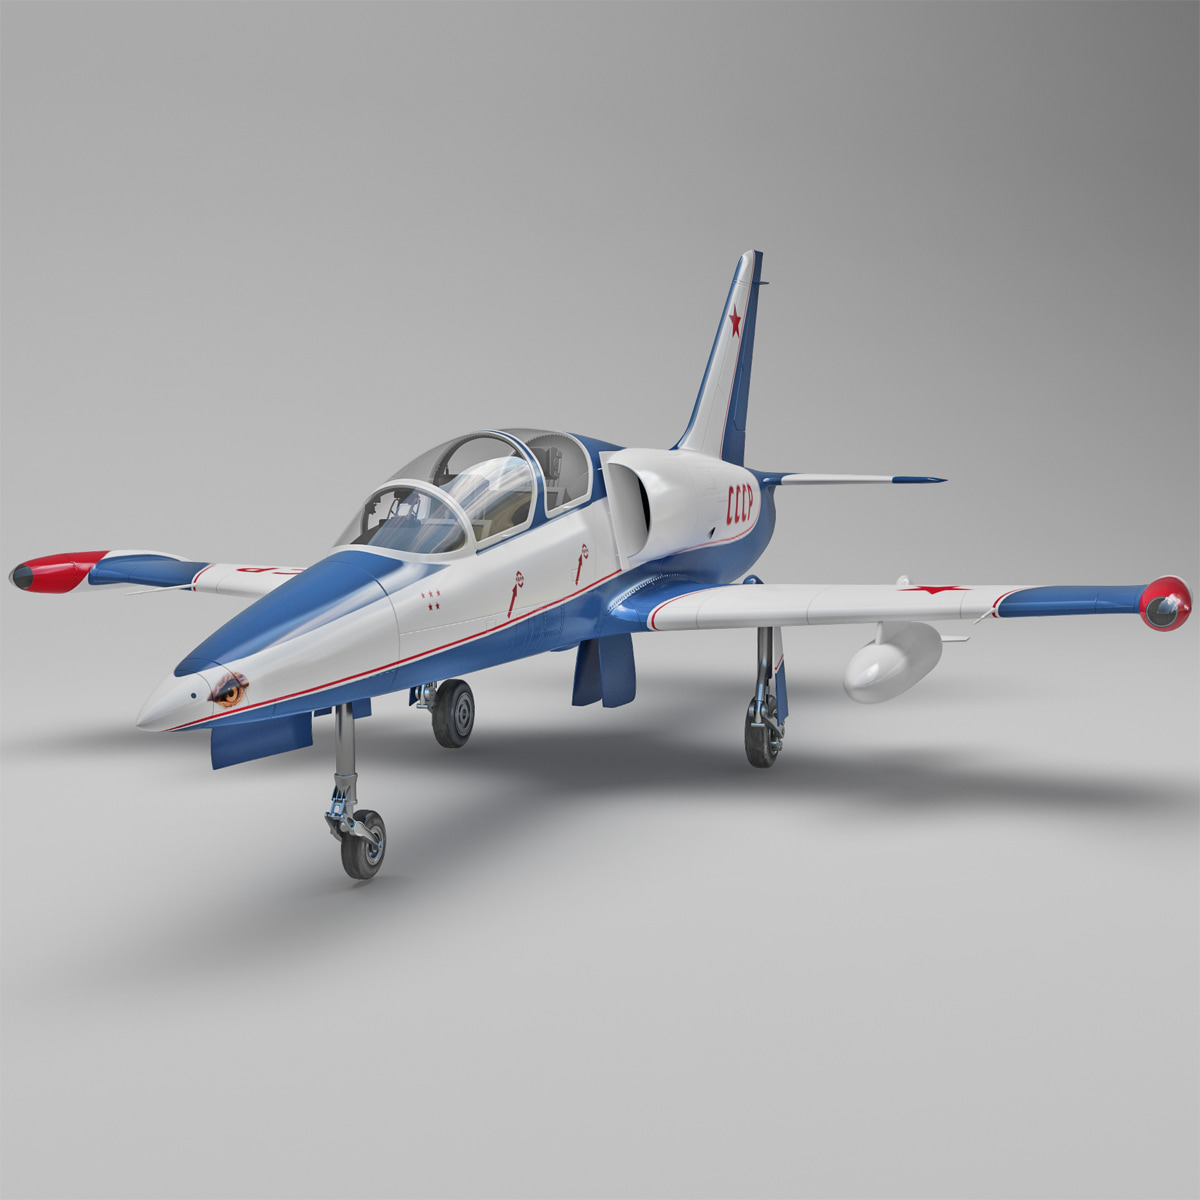 Aero Vodochody L-39 Albatros Russian Jet Trainer Aircraft_2.jpg